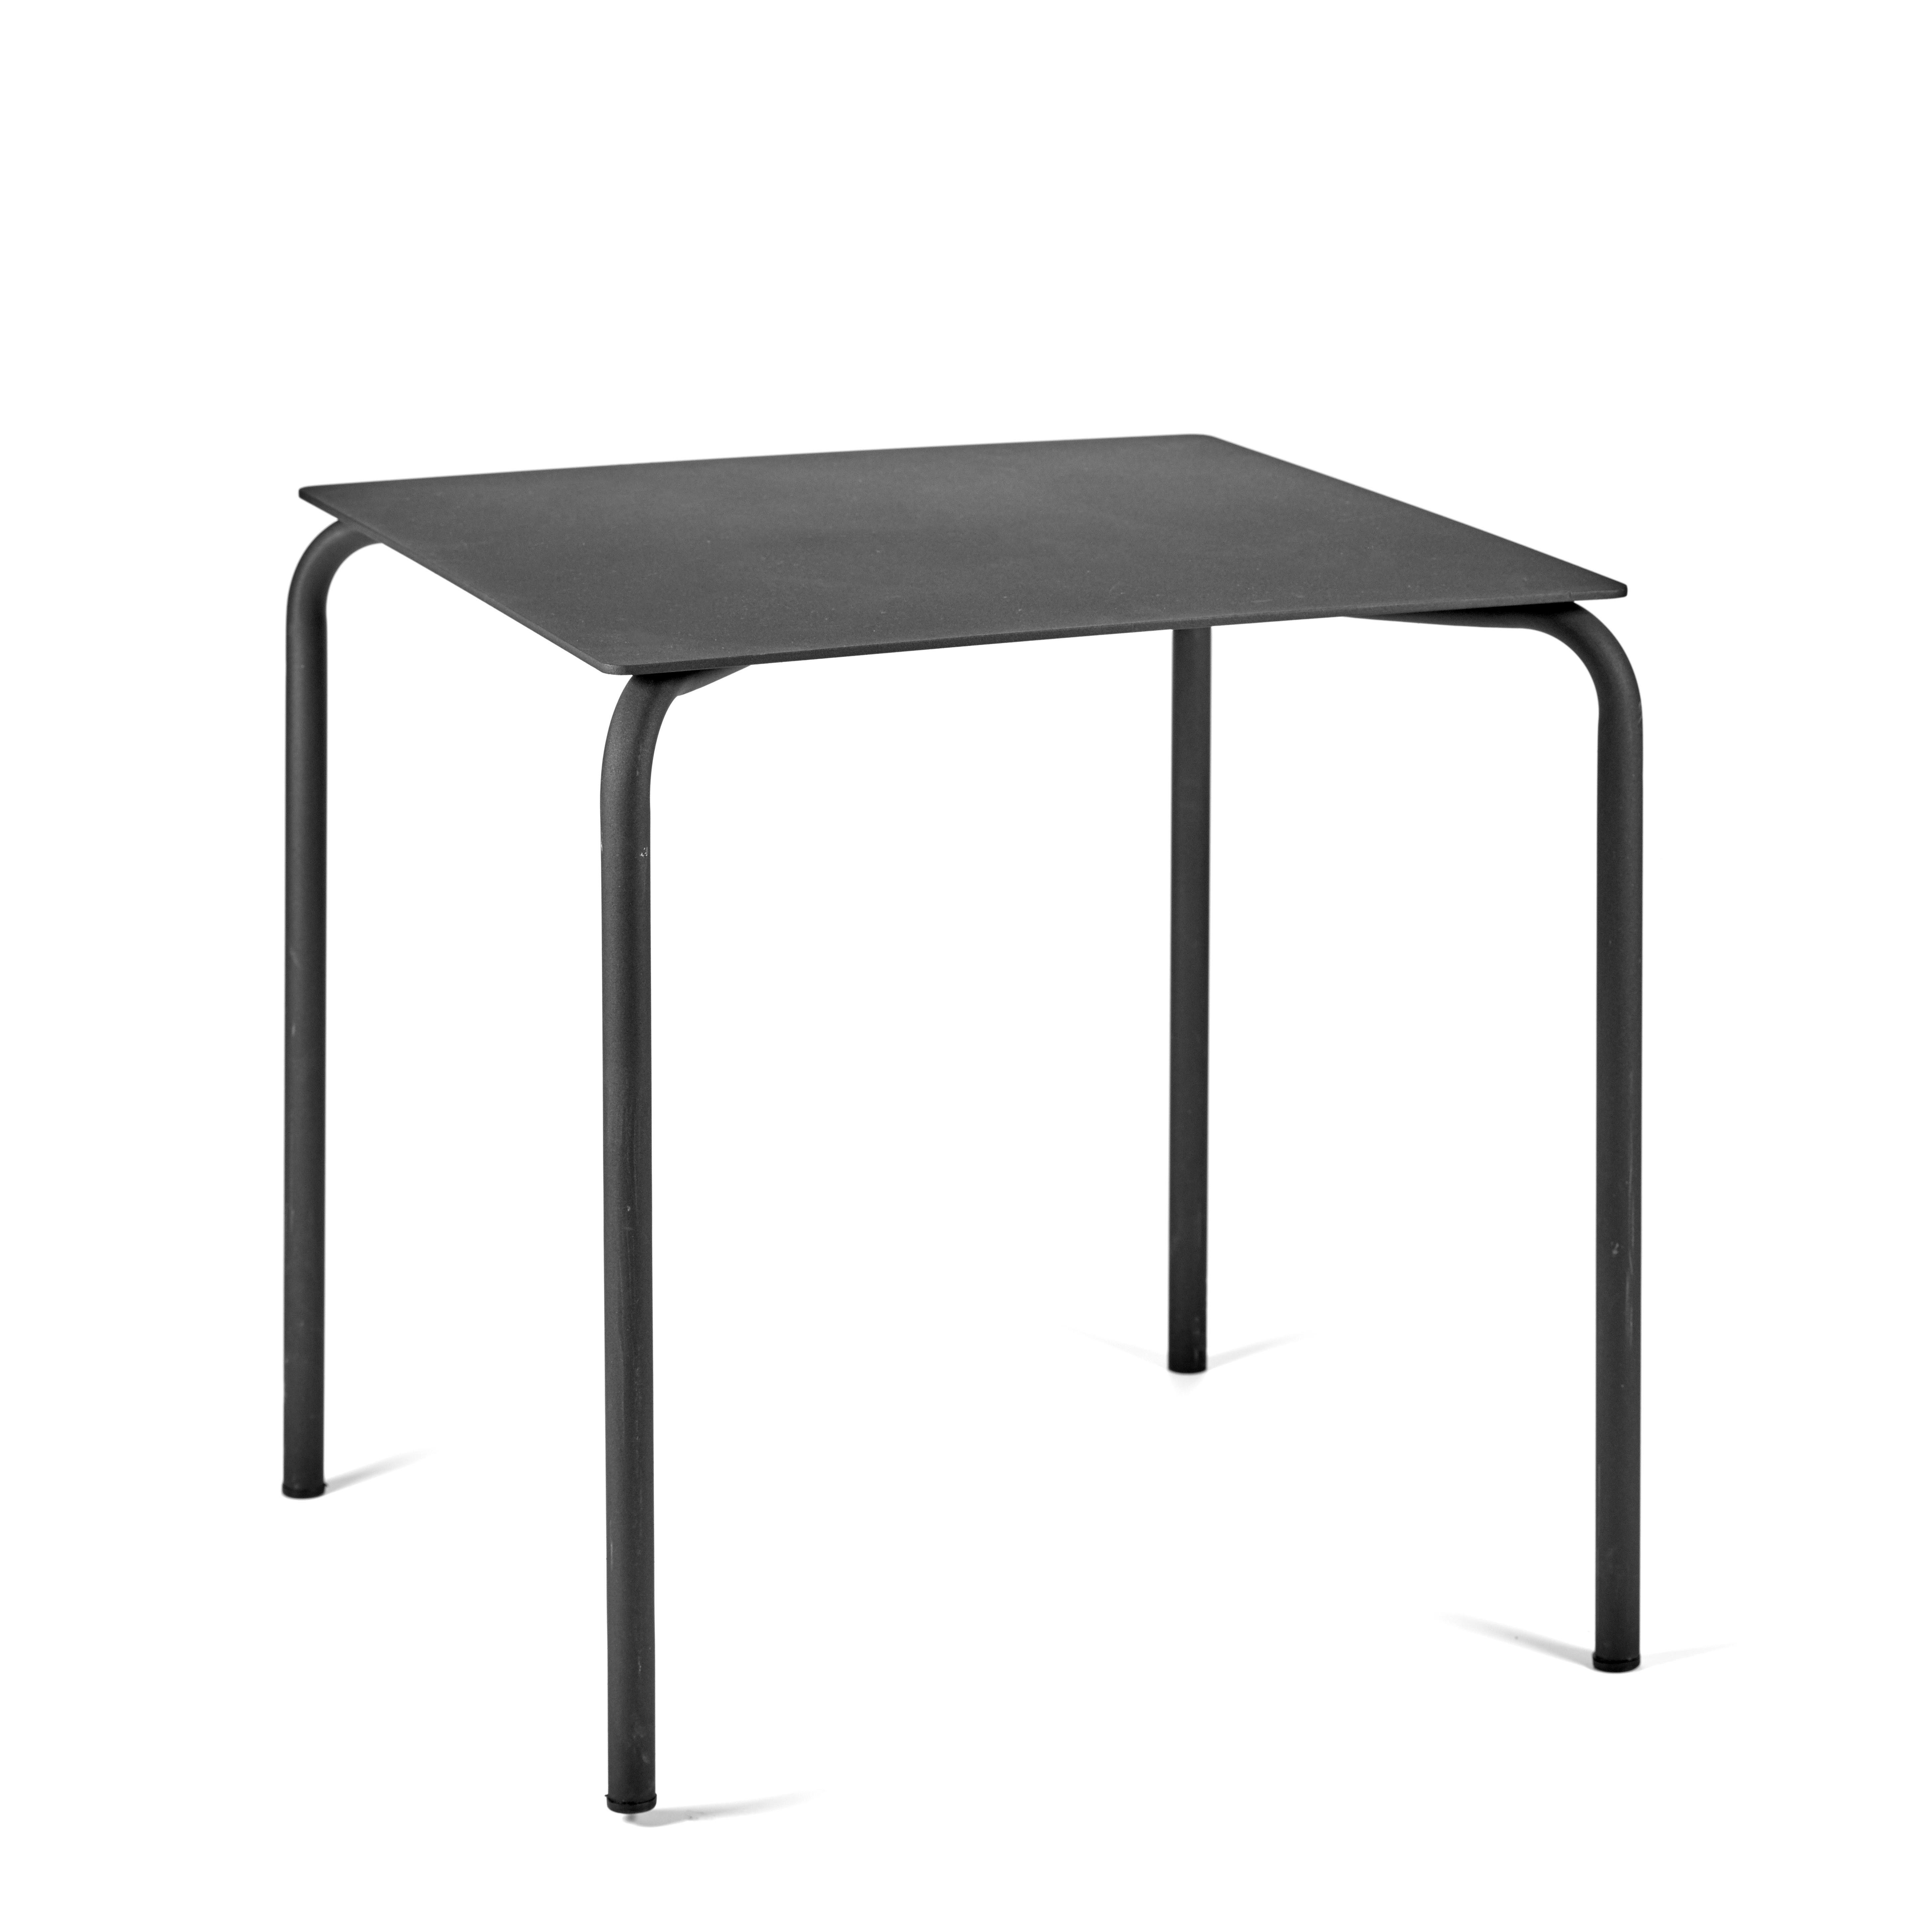 Outdoor - Tables de jardin - Table August / Aluminium - 70 x 70 cm - Serax - Noir - Aluminium thermolaqué